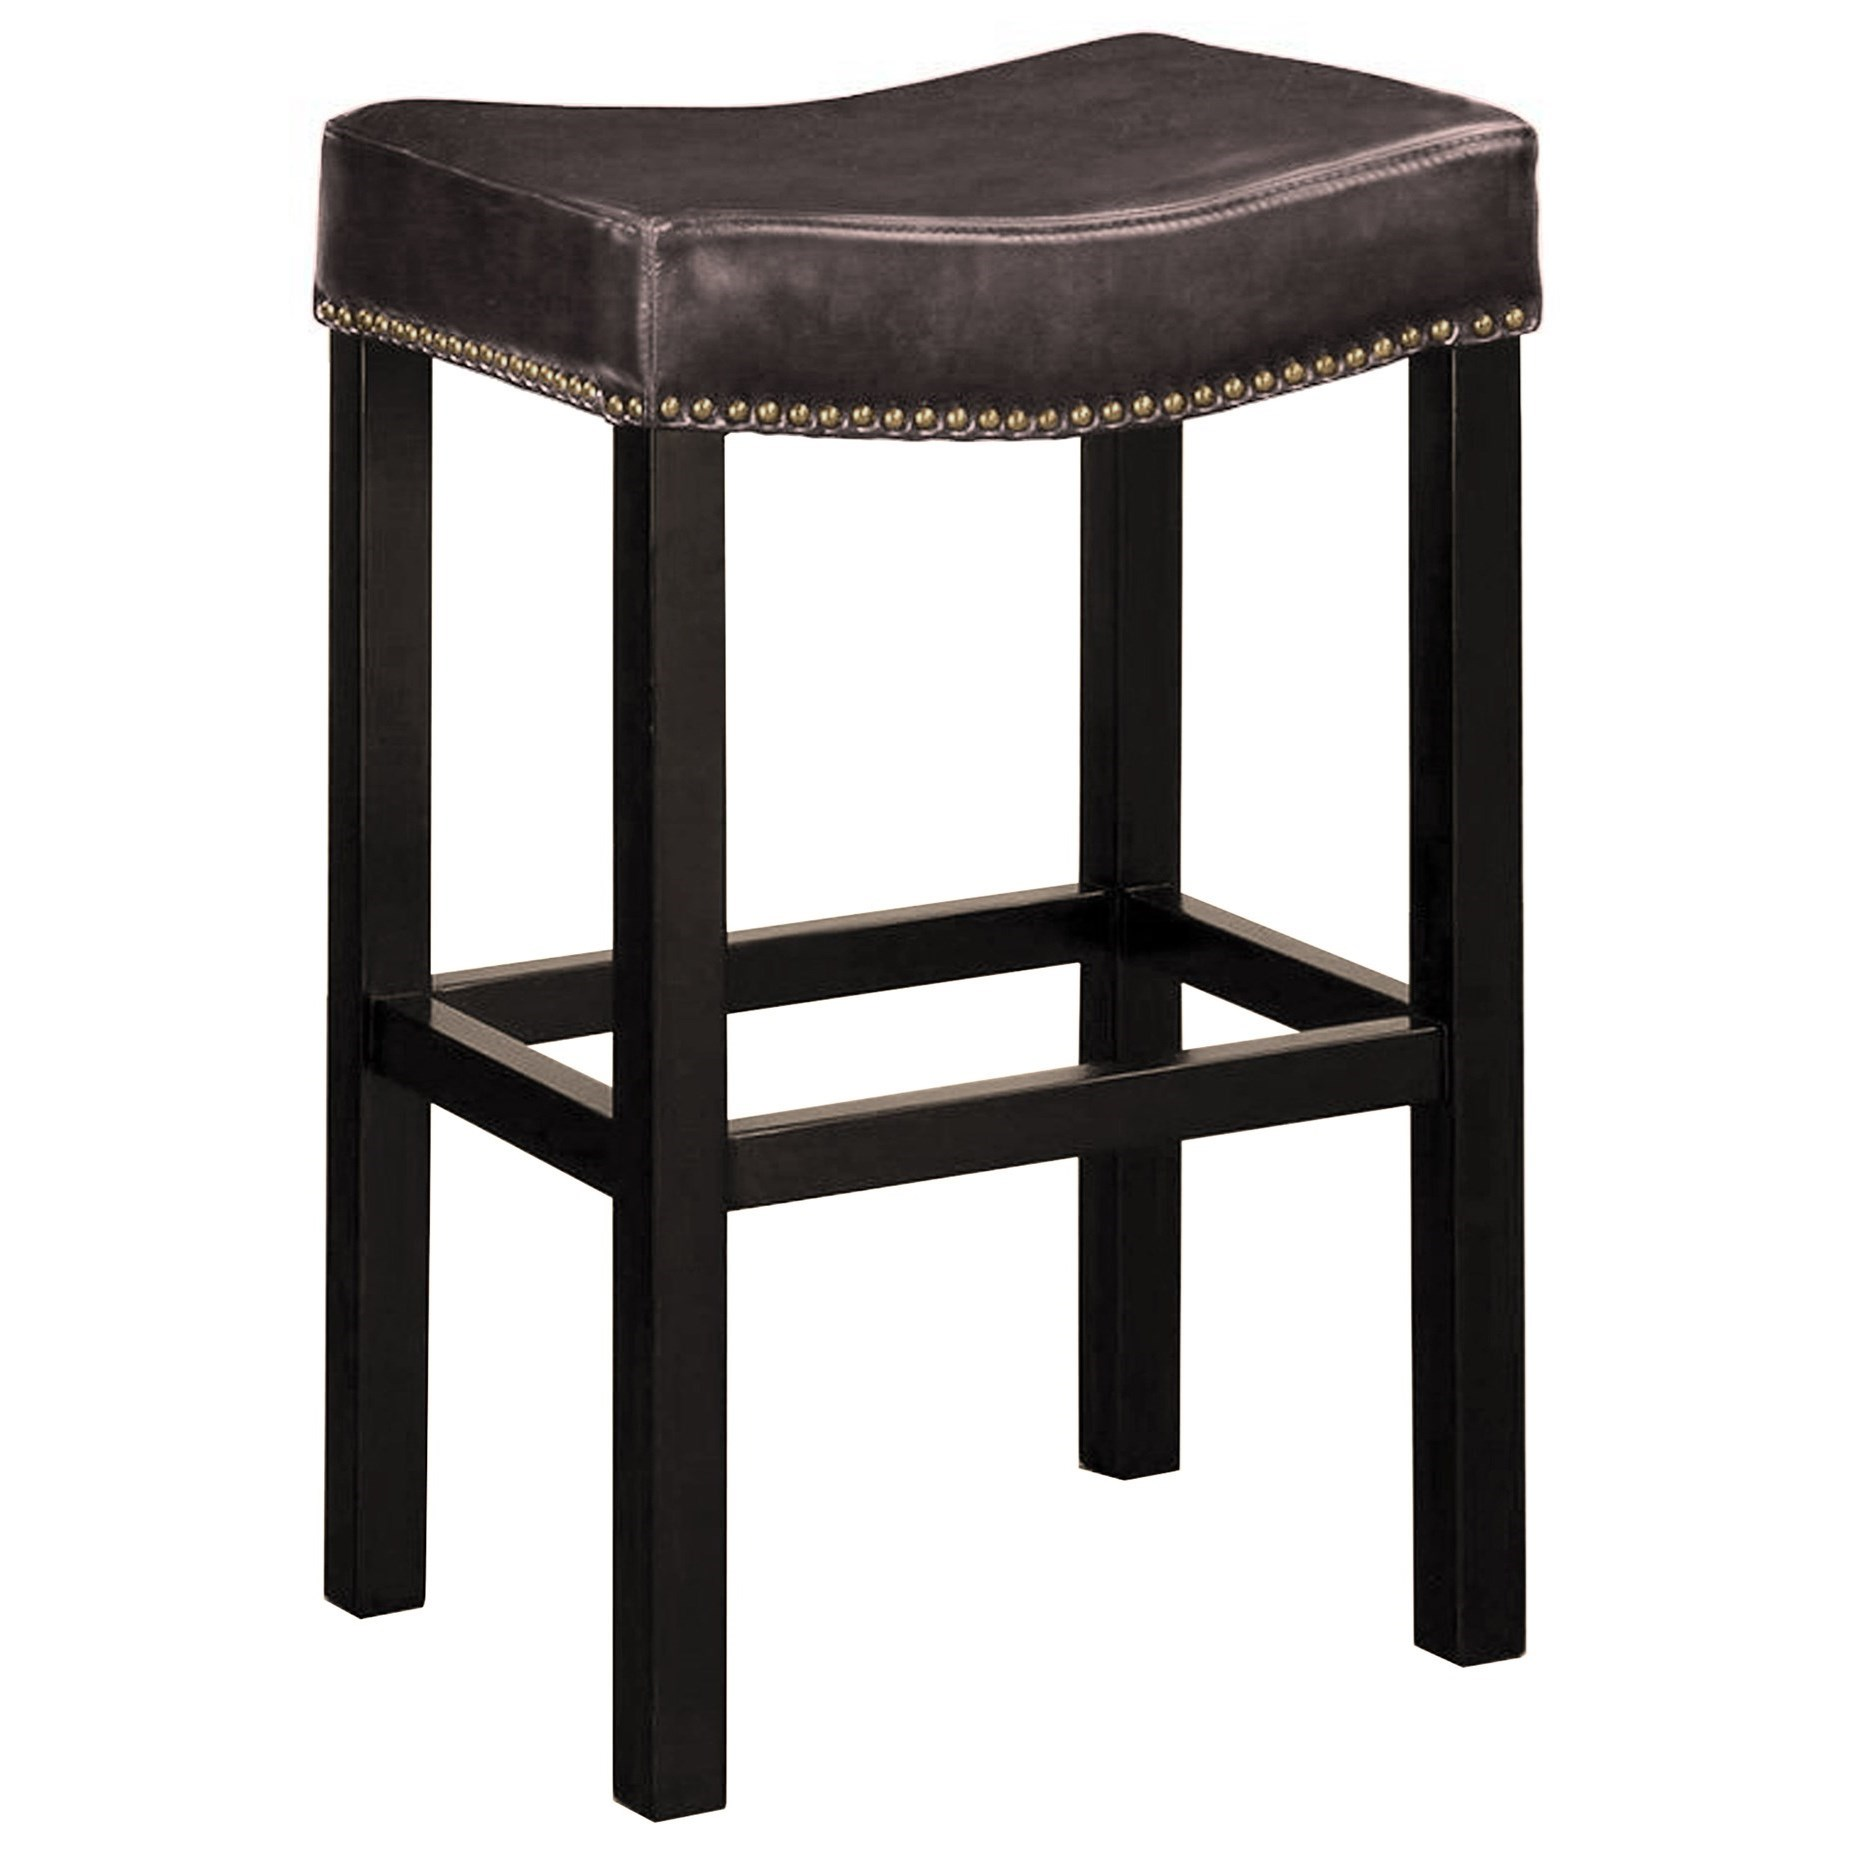 "Tudor 30"" Backless Stationary Barstool at Sadler's Home Furnishings"